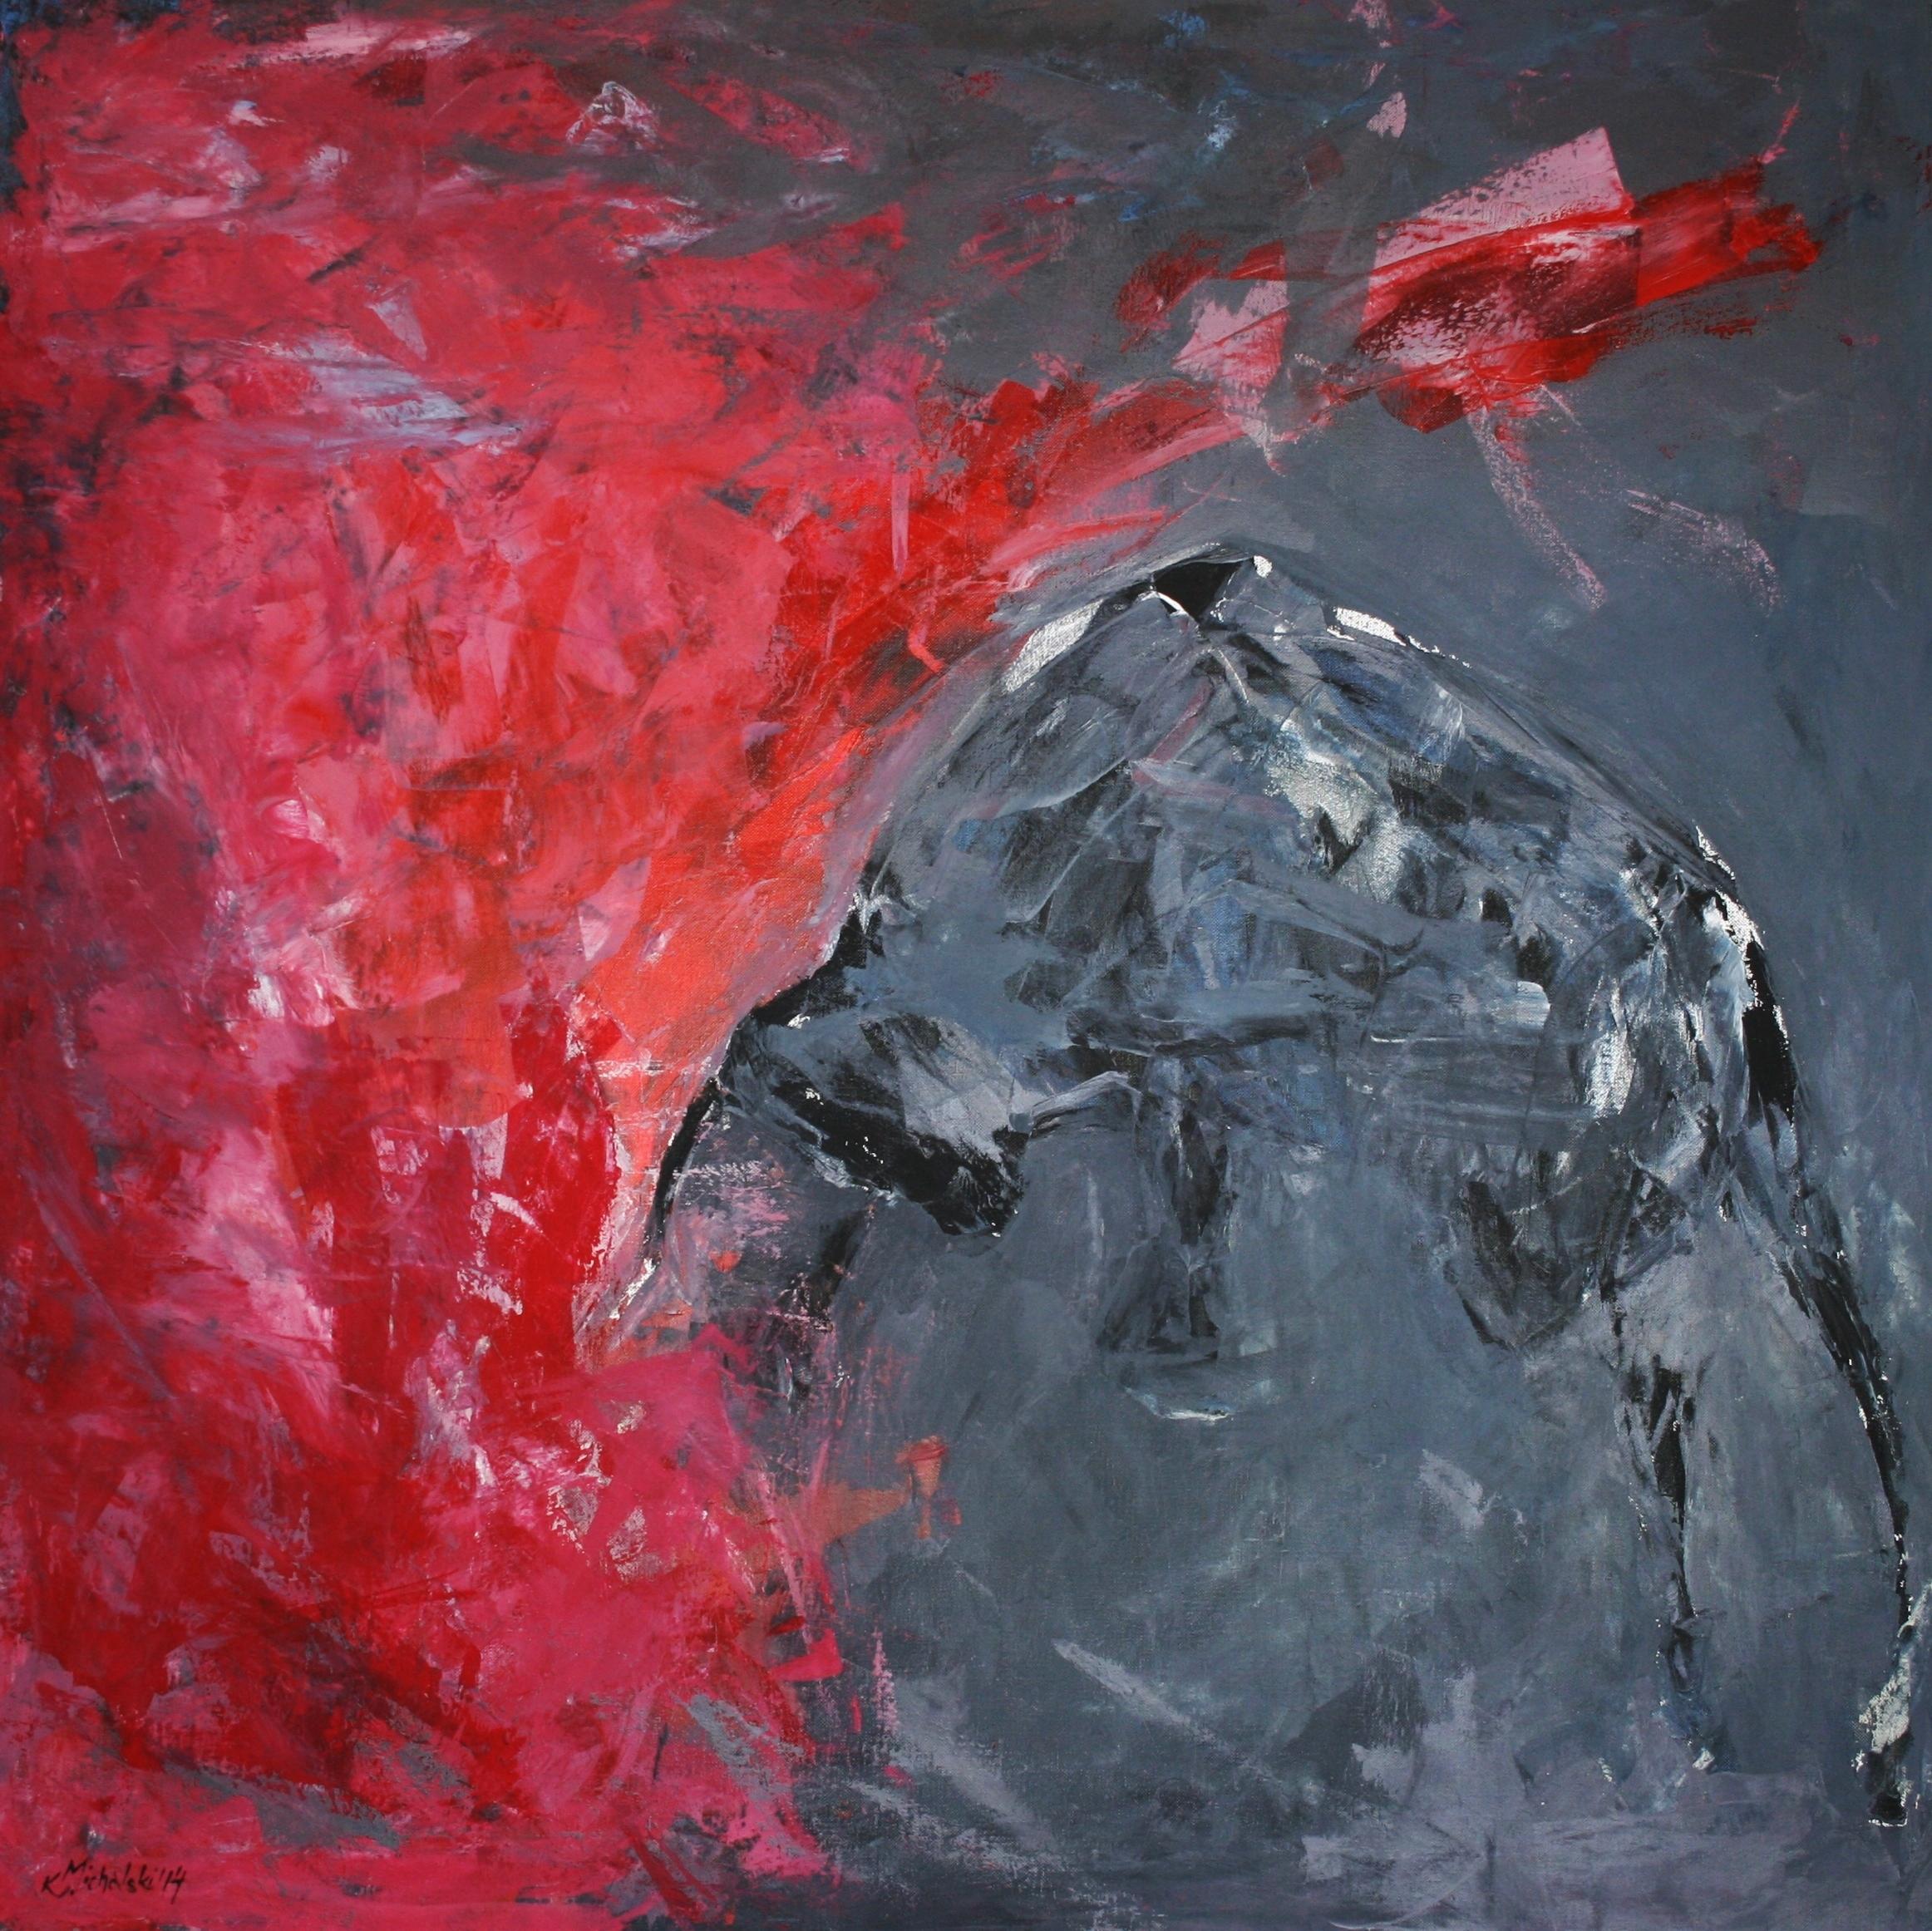 Der Kampf, 2014, 100 x 100, Acryl auf Leinwand